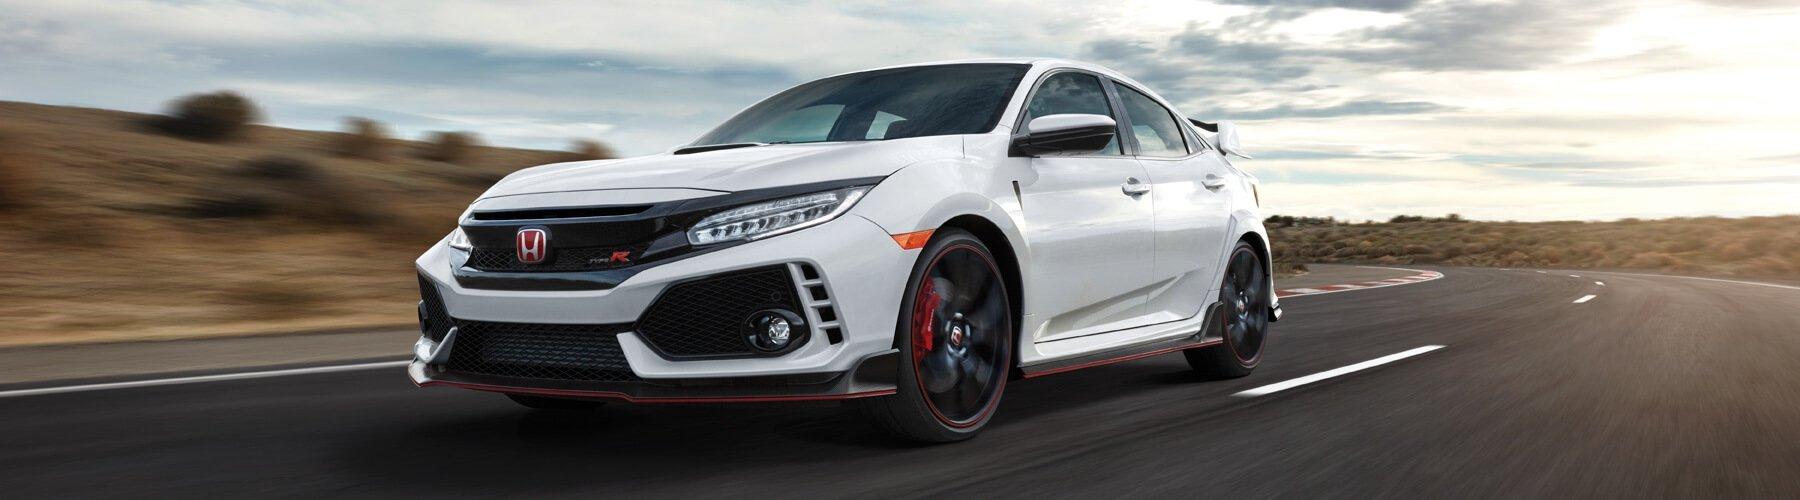 2017 Honda Civic Type R Banner